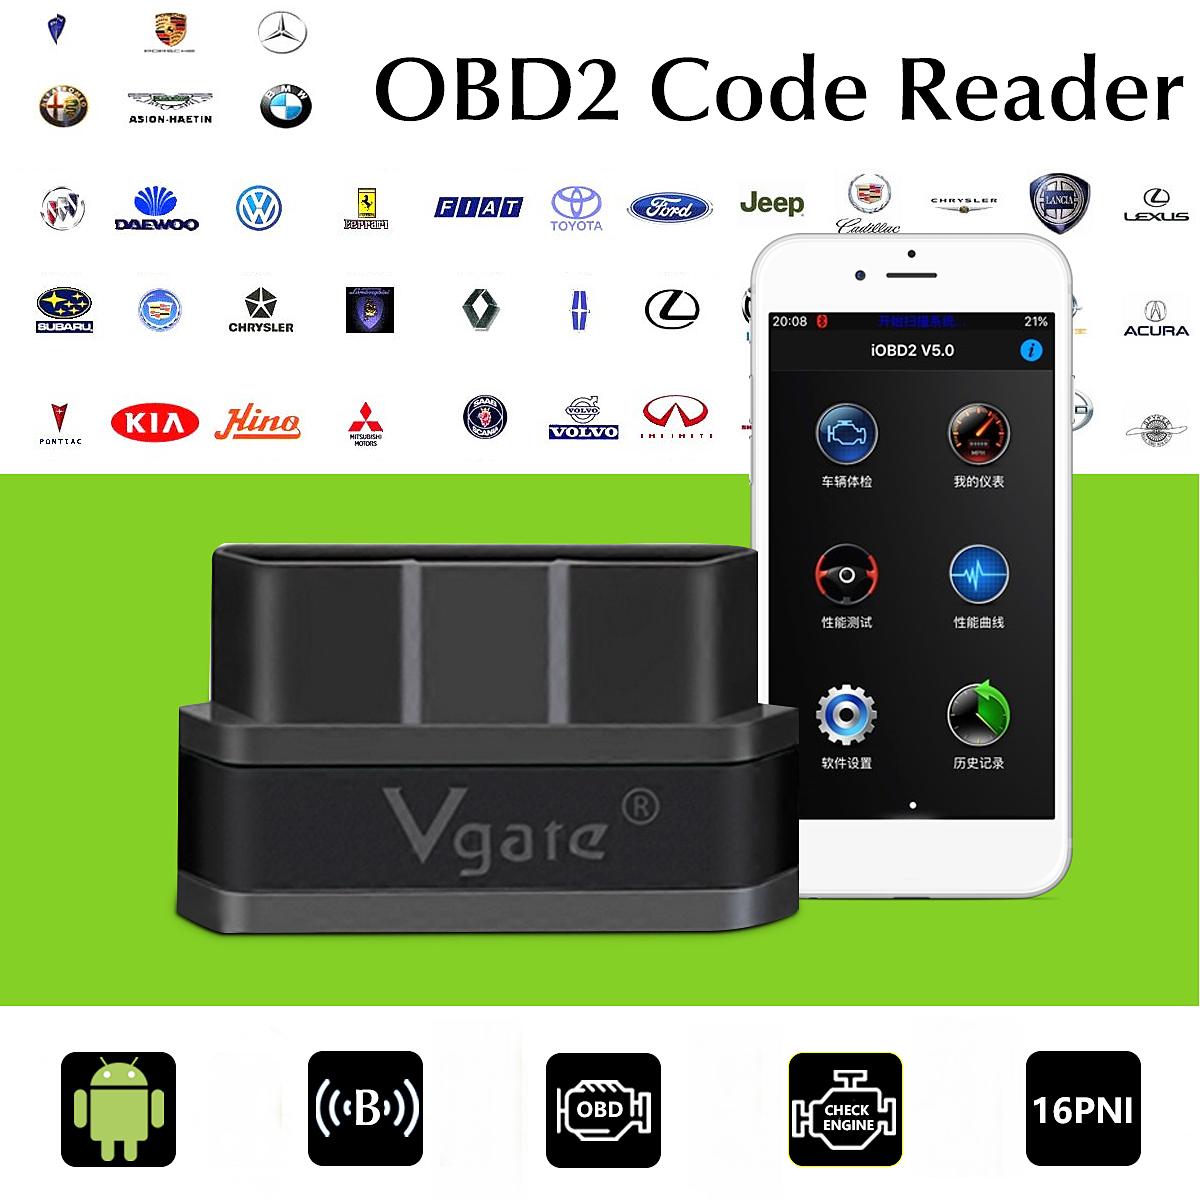 Vgate iCar 2 ELM327 bluetooth OBD2 Car Code Reader Scanner for iPhone  Android